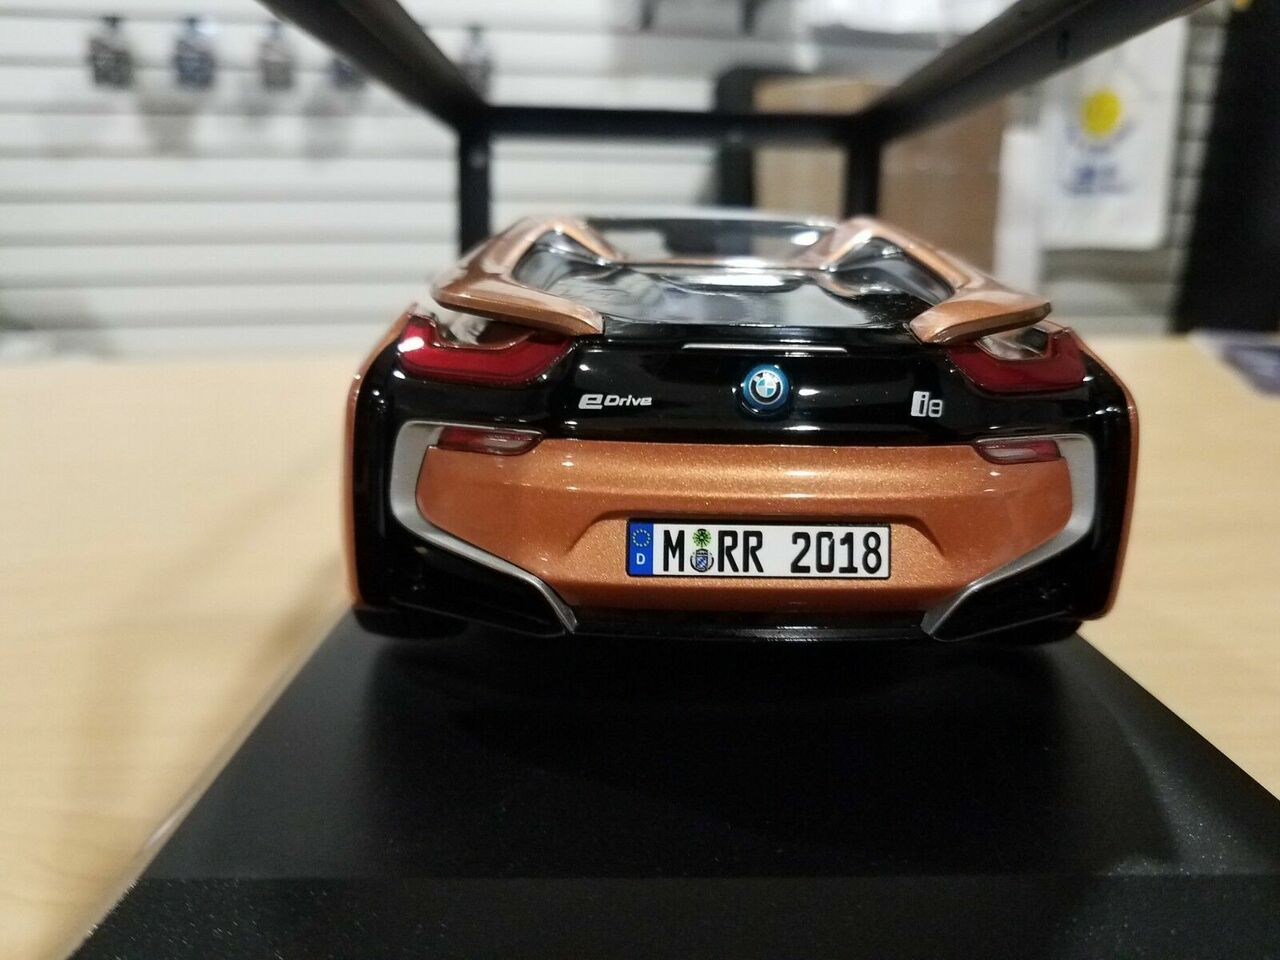 1 18 Dealer Edition Bmw I8 Roadster Copper Orange Black Diecast Car Model Livecarmodel Com